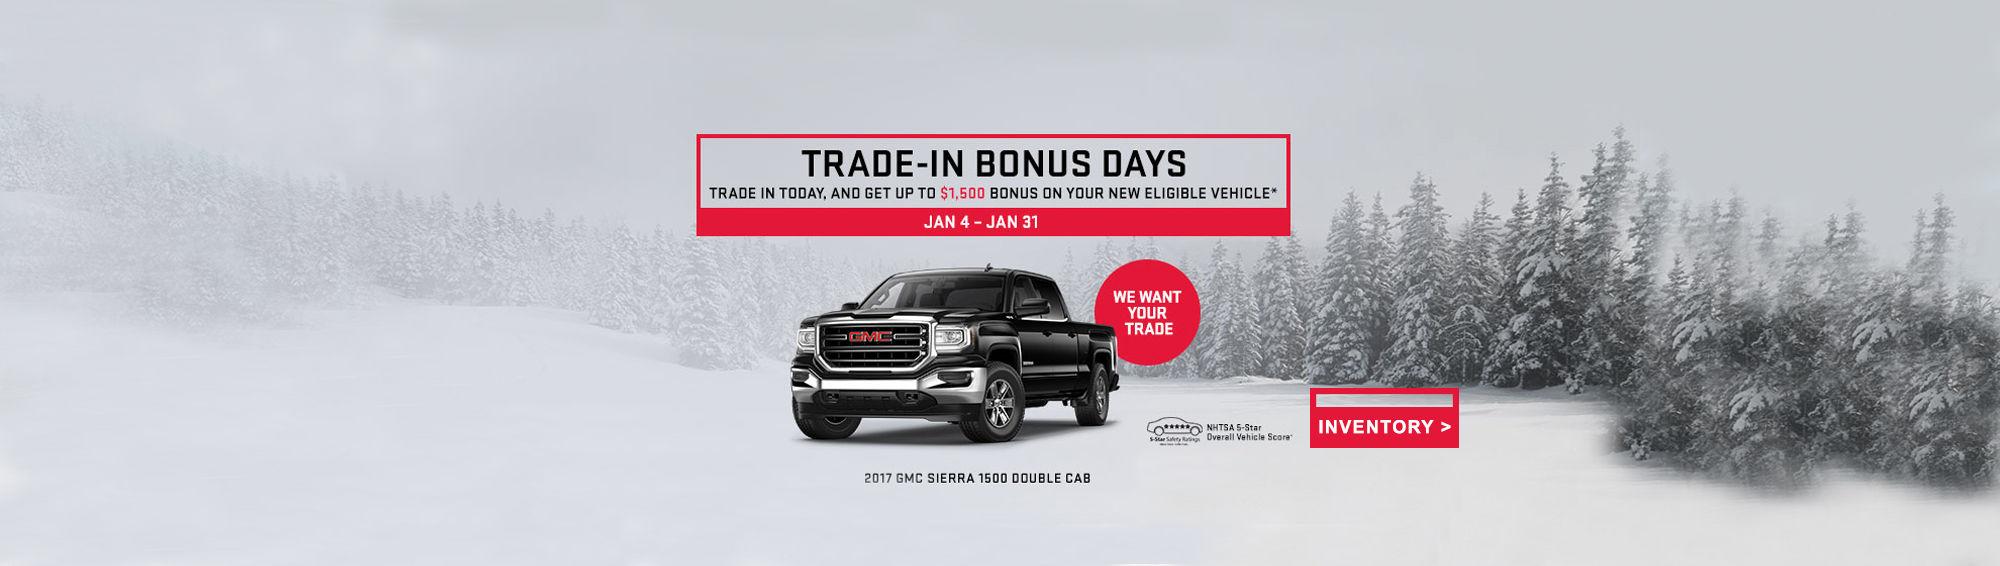 GMC Trade-In Bonus Days